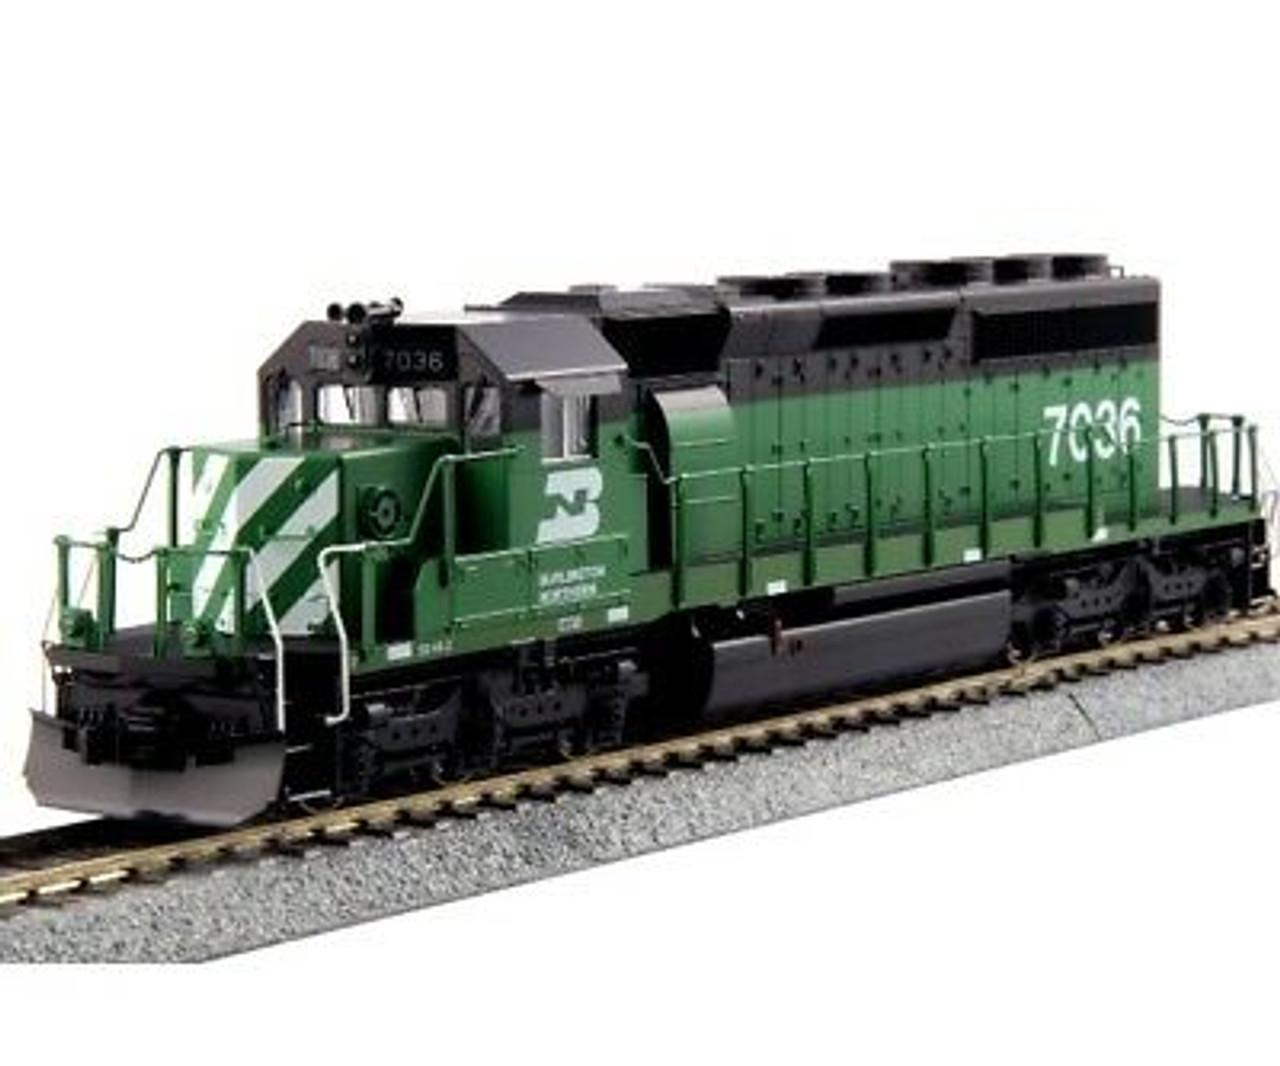 KAT376604LS  HO SD40-2 Diesel BN #7036 w/LokSound